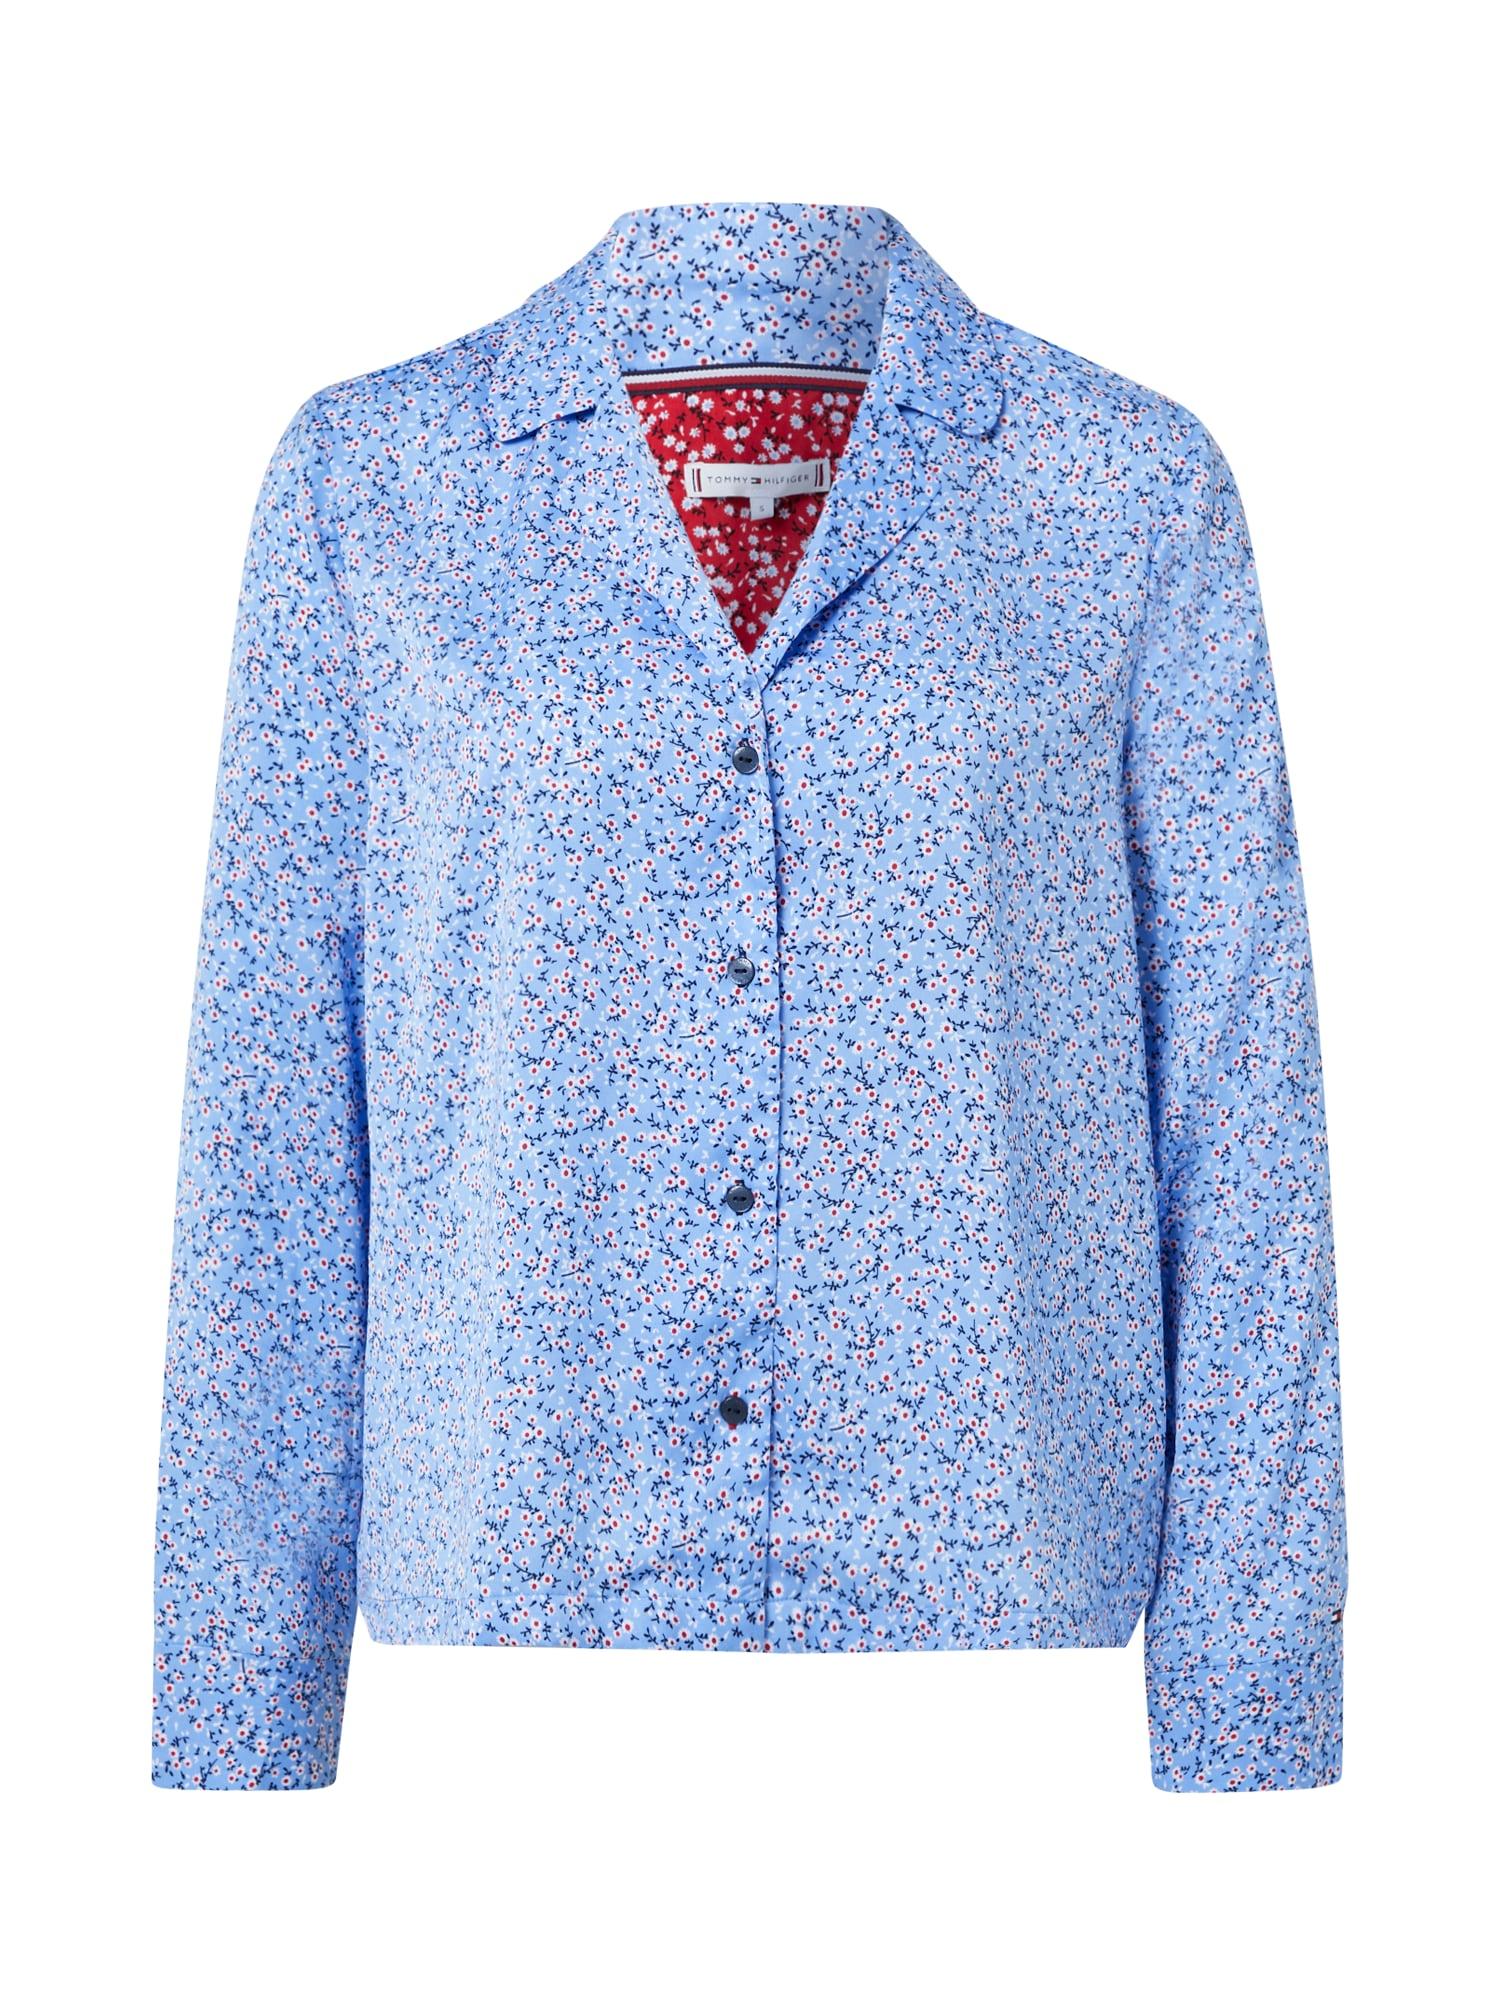 Tommy Hilfiger Underwear Pižaminiai marškinėliai šviesiai mėlyna / balta / mėlyna